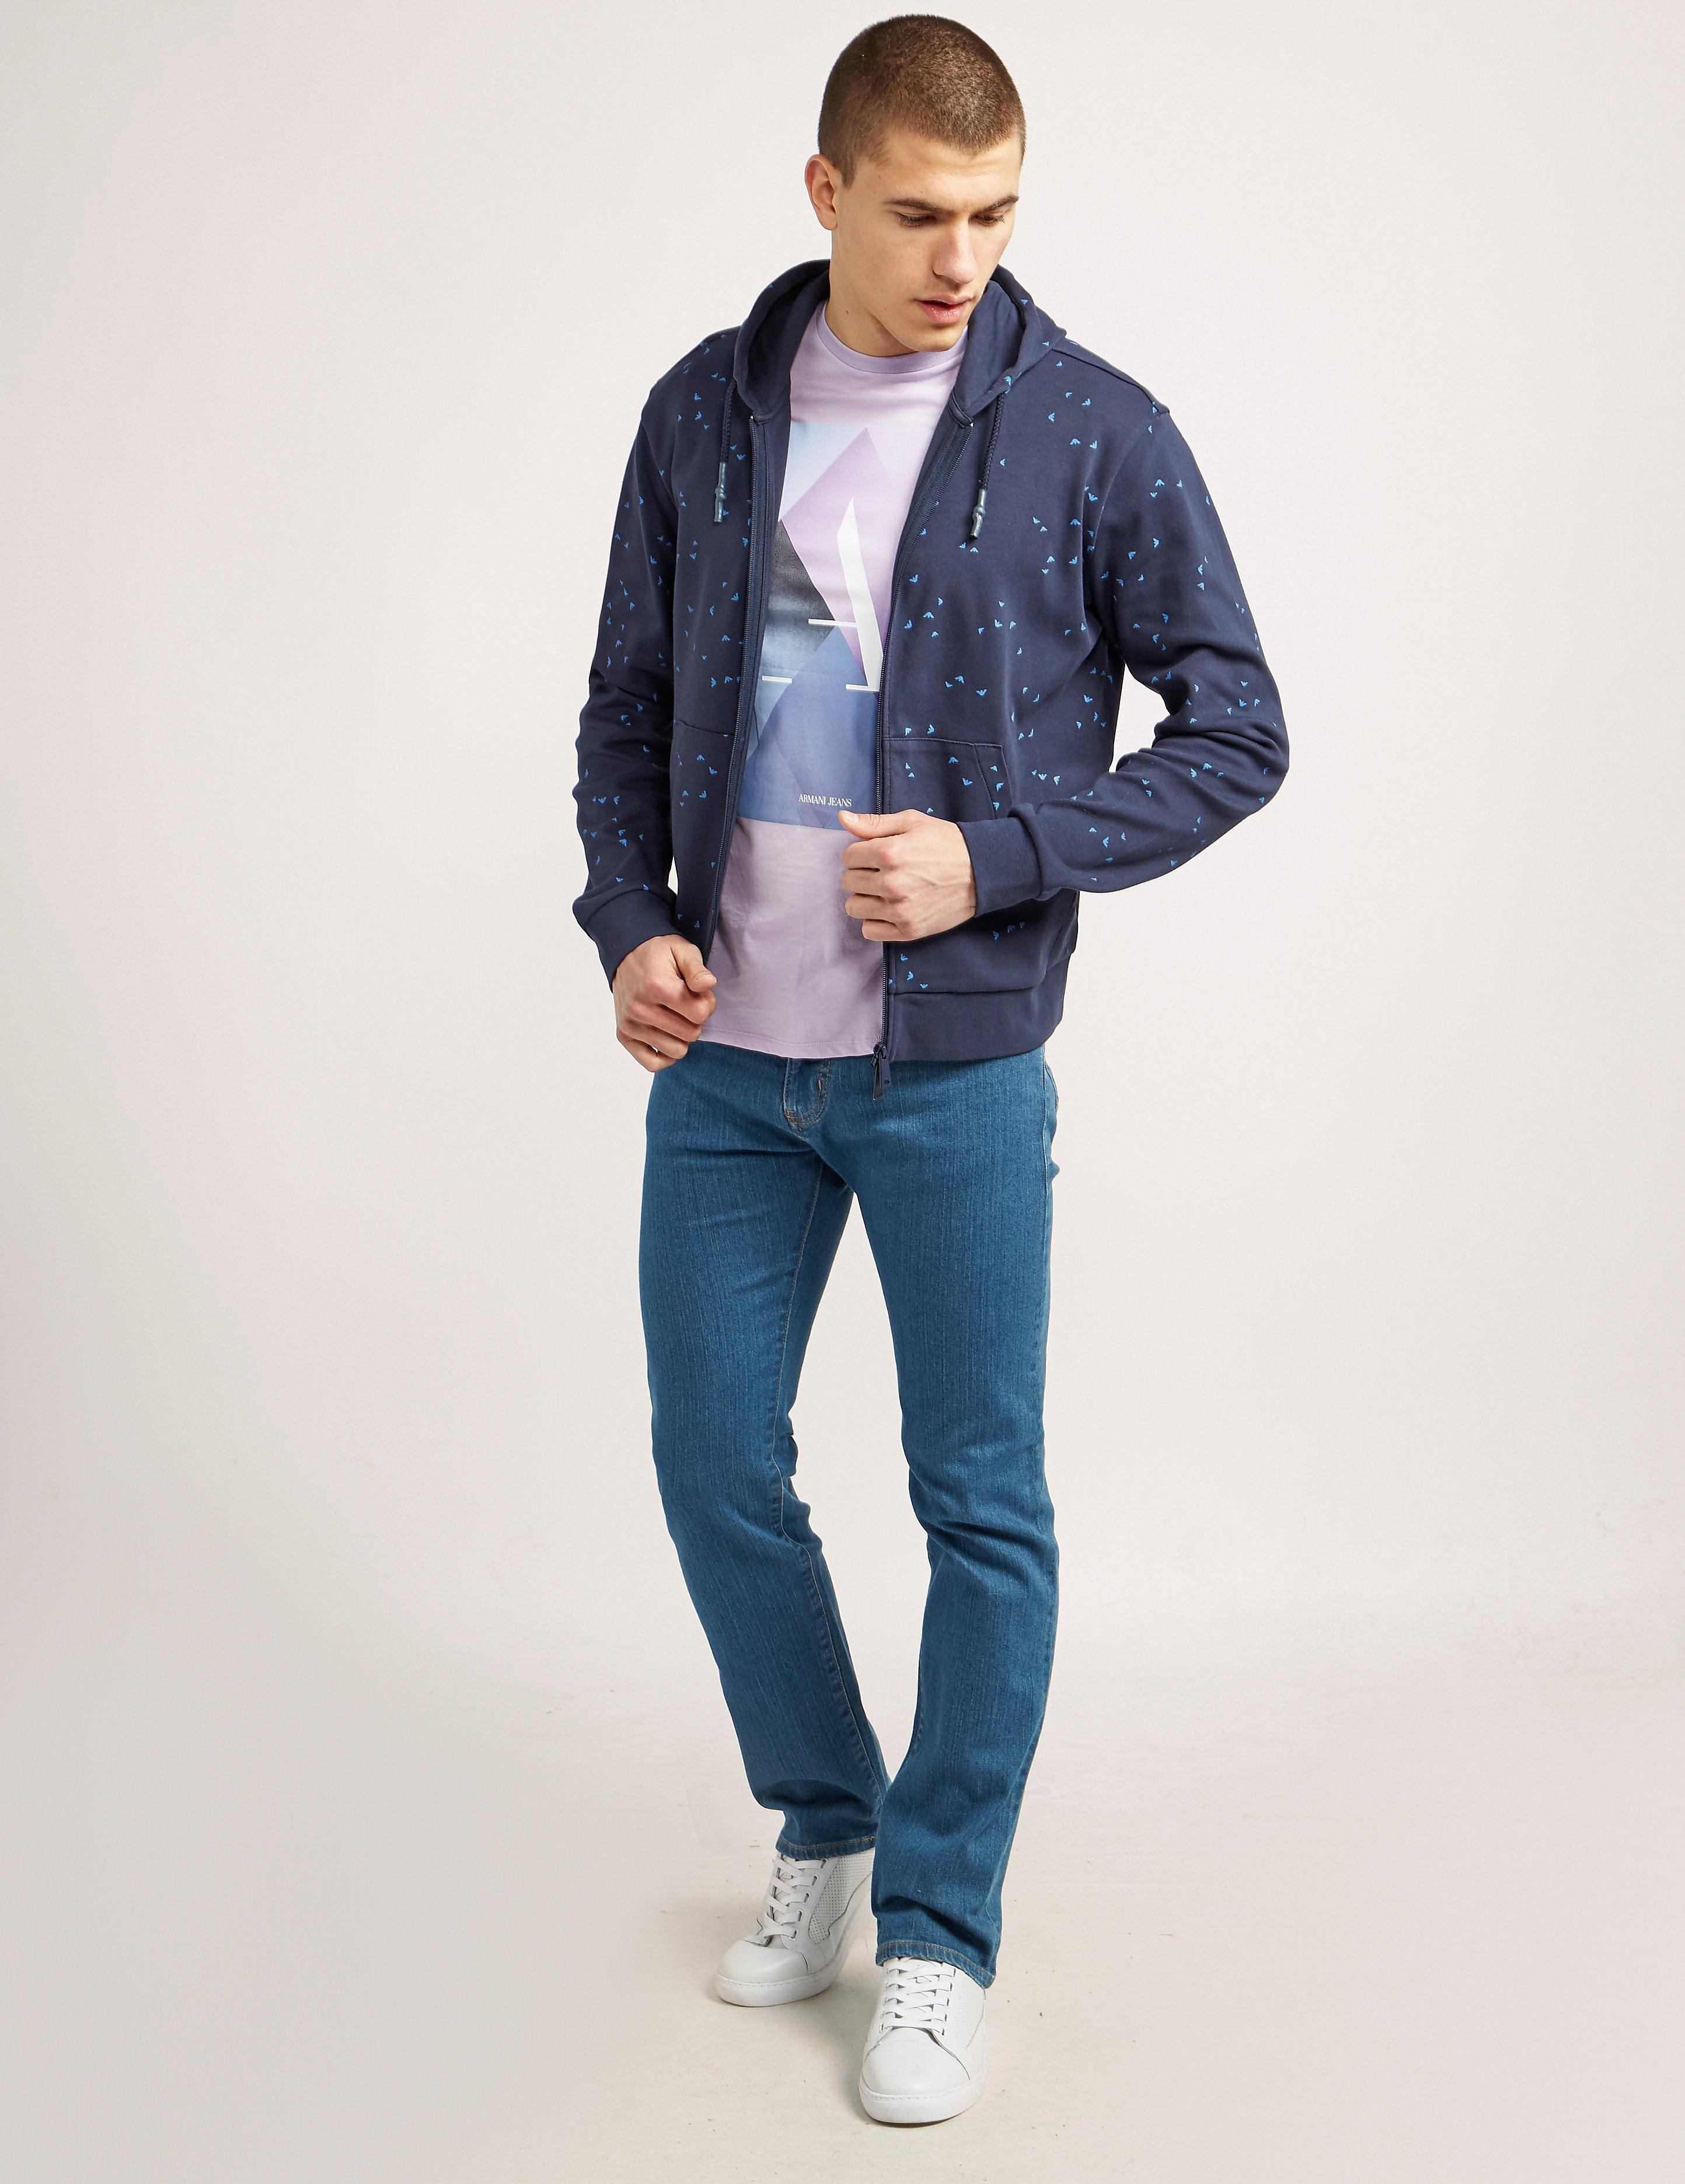 Armani Jeans J45 Jeans - Long